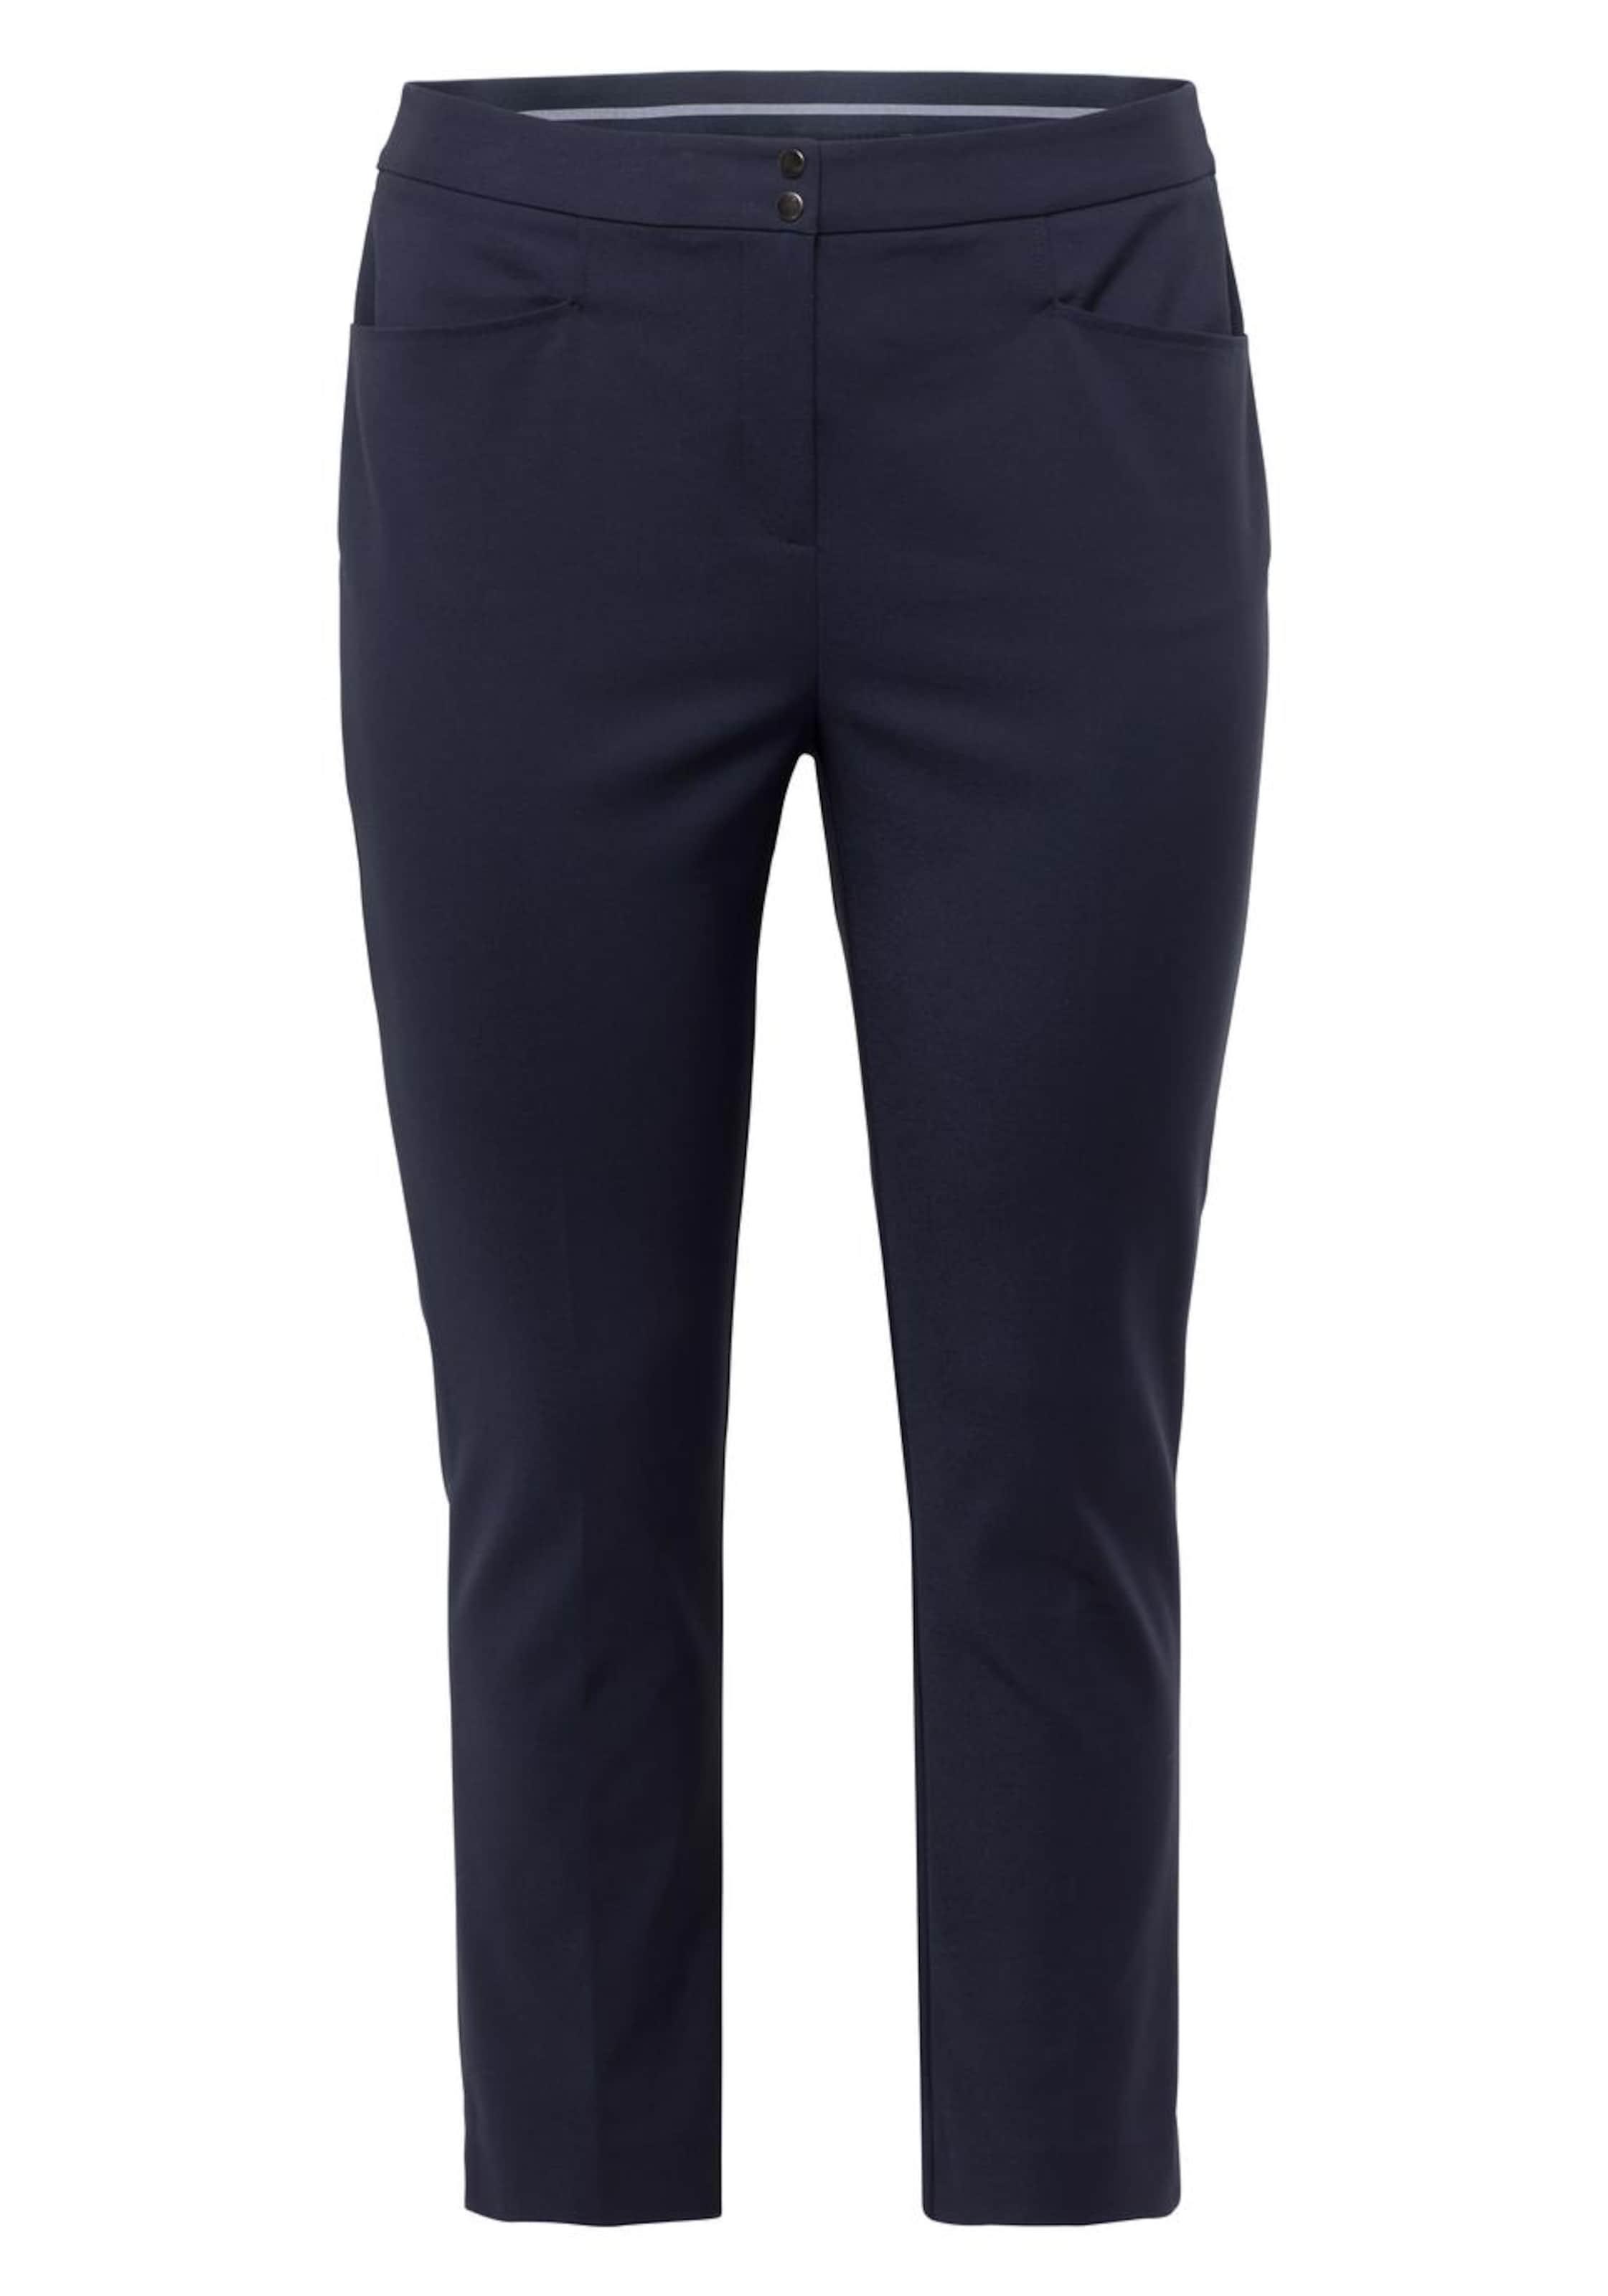 Style Bügelfaltenhose MarineWeiß Bügelfaltenhose Bügelfaltenhose Sheego Sheego MarineWeiß Style Sheego In Style In TKc1JlF